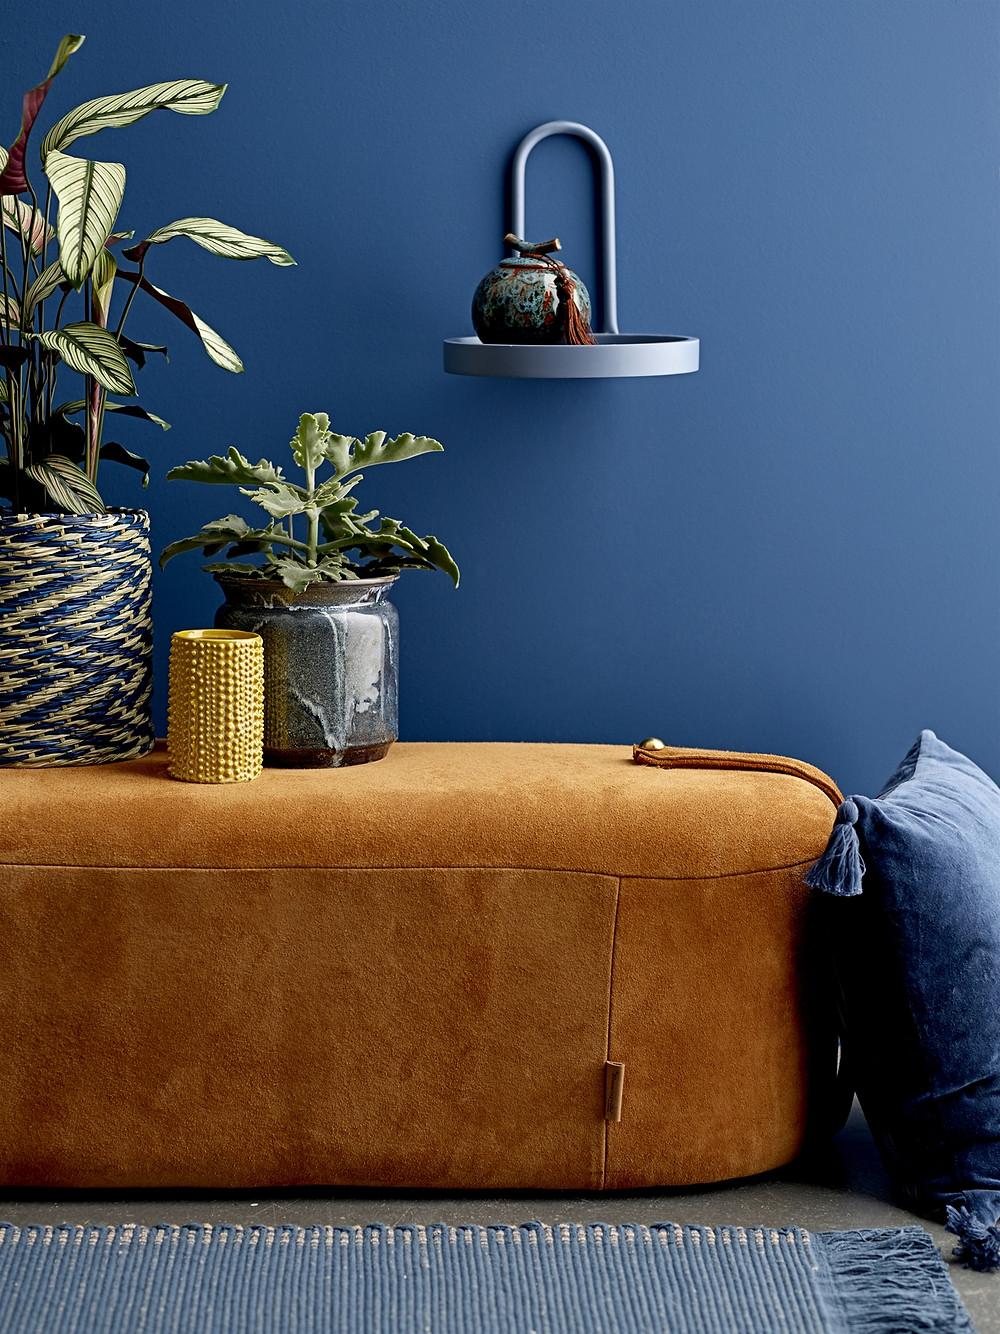 décoration intérieure tendance en bleu profond